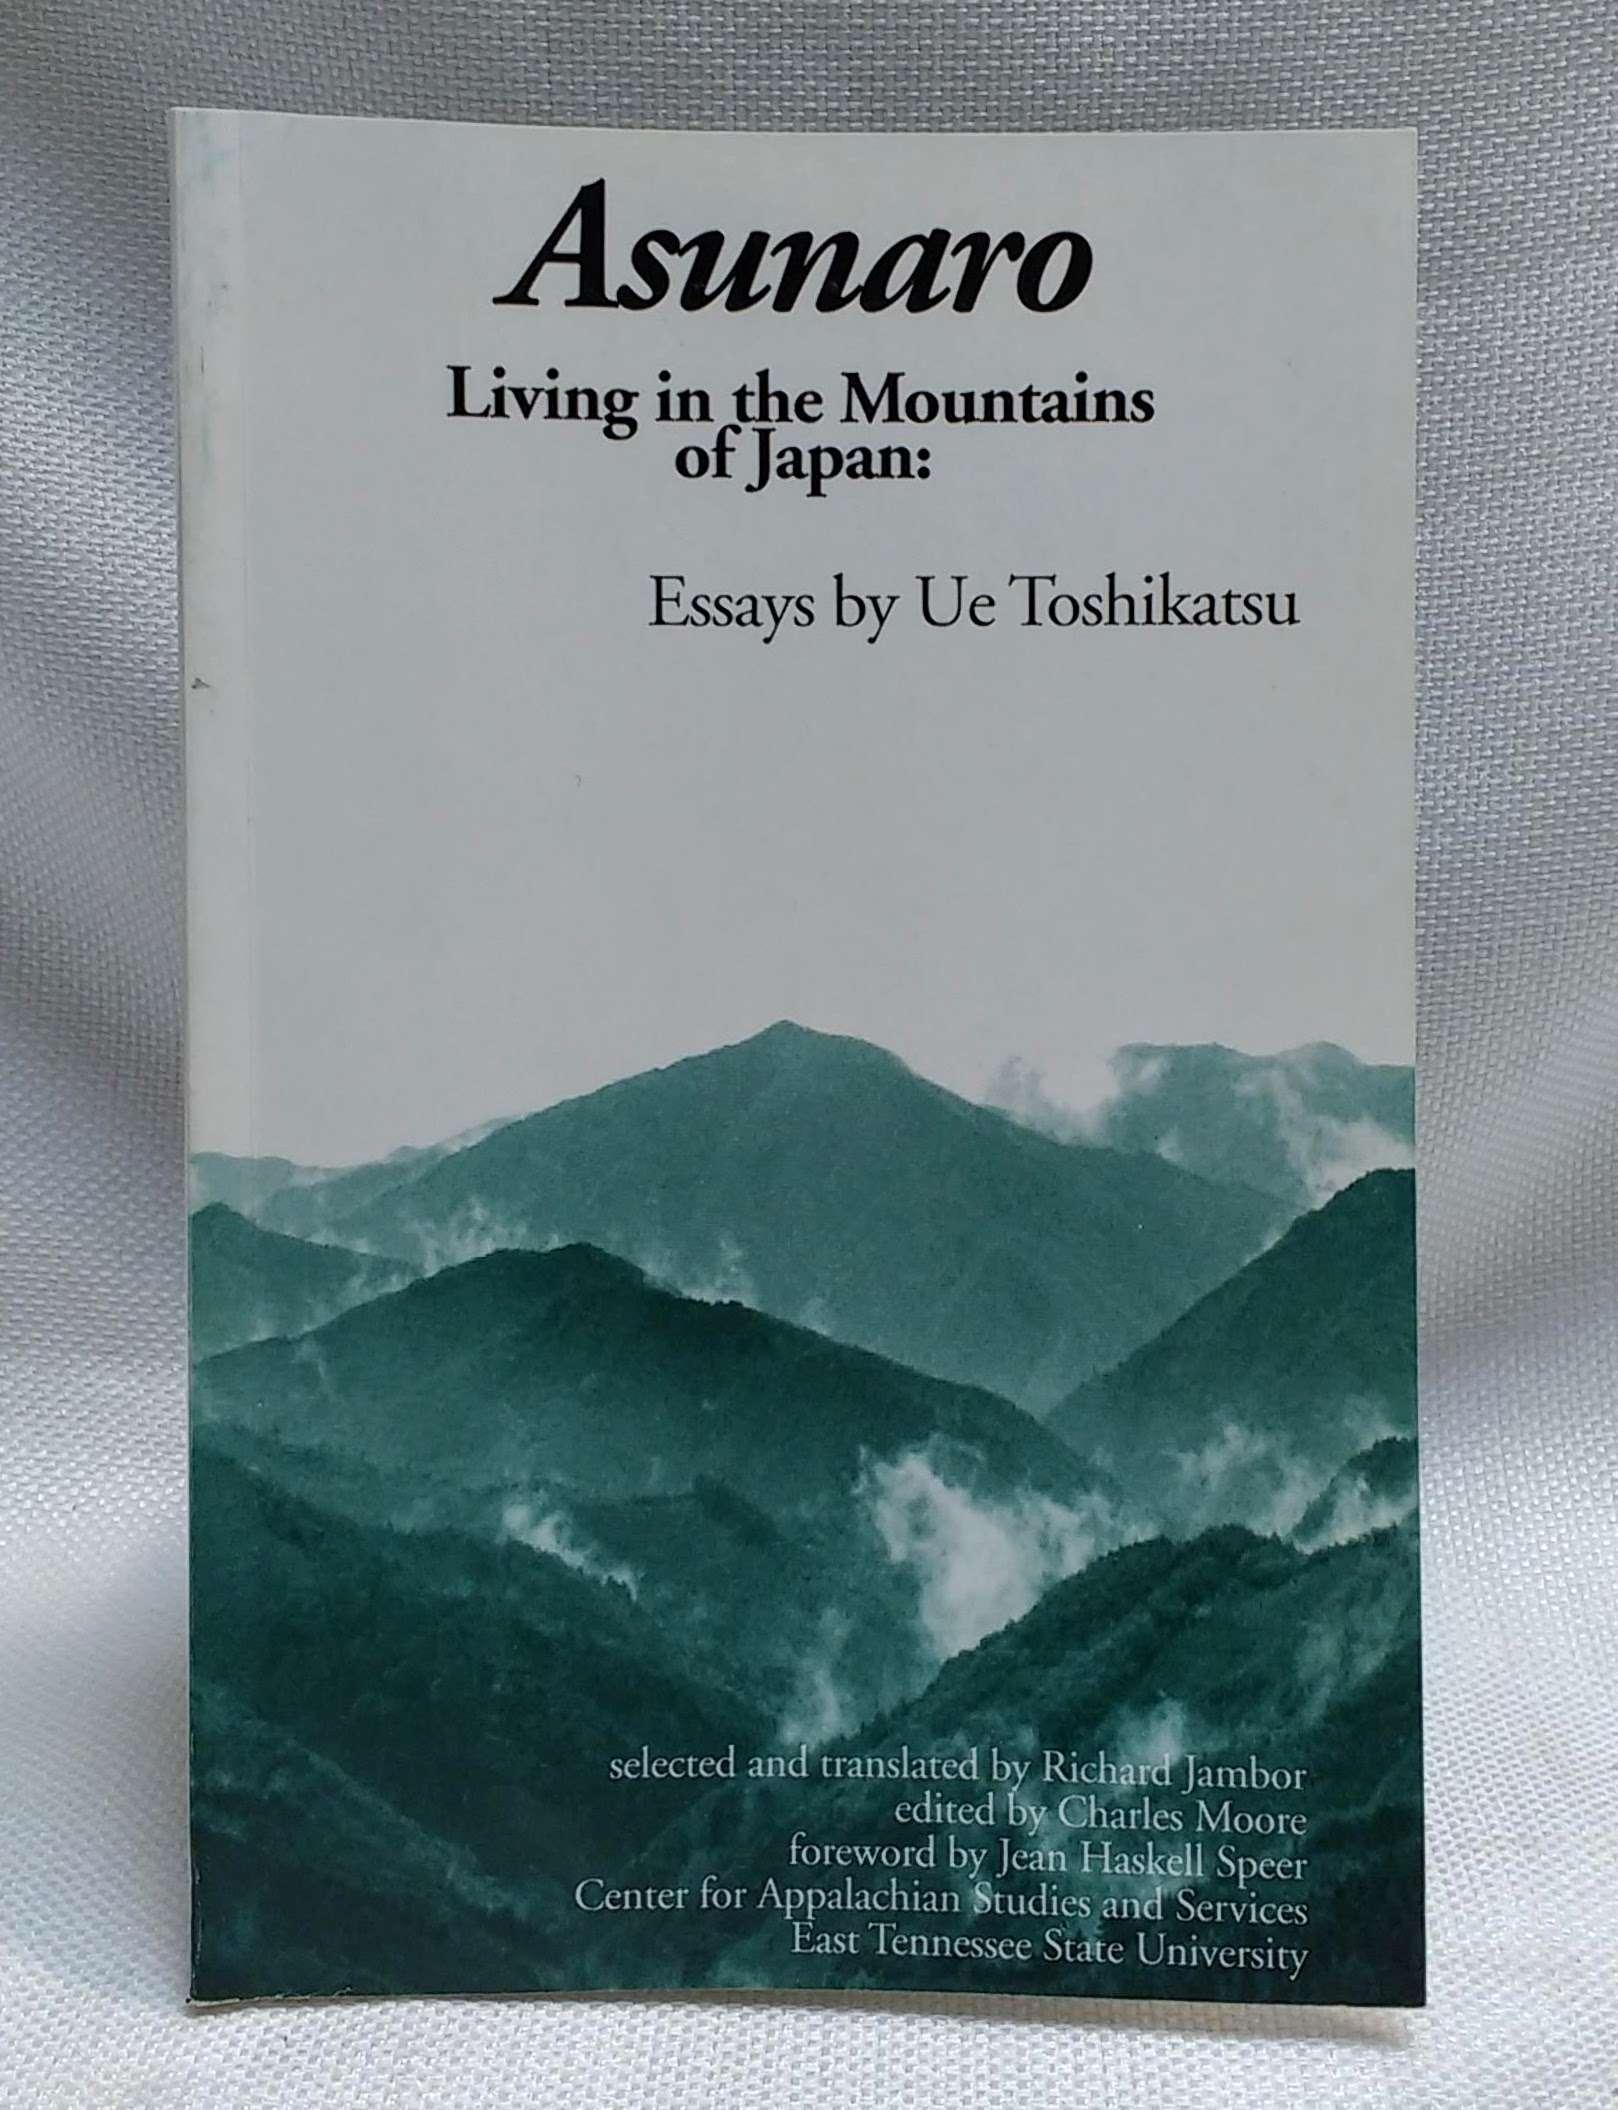 Asunaro: Living in the mountains of Japan : essays by Ue Toshikatsu, Toshikatsu, Ue